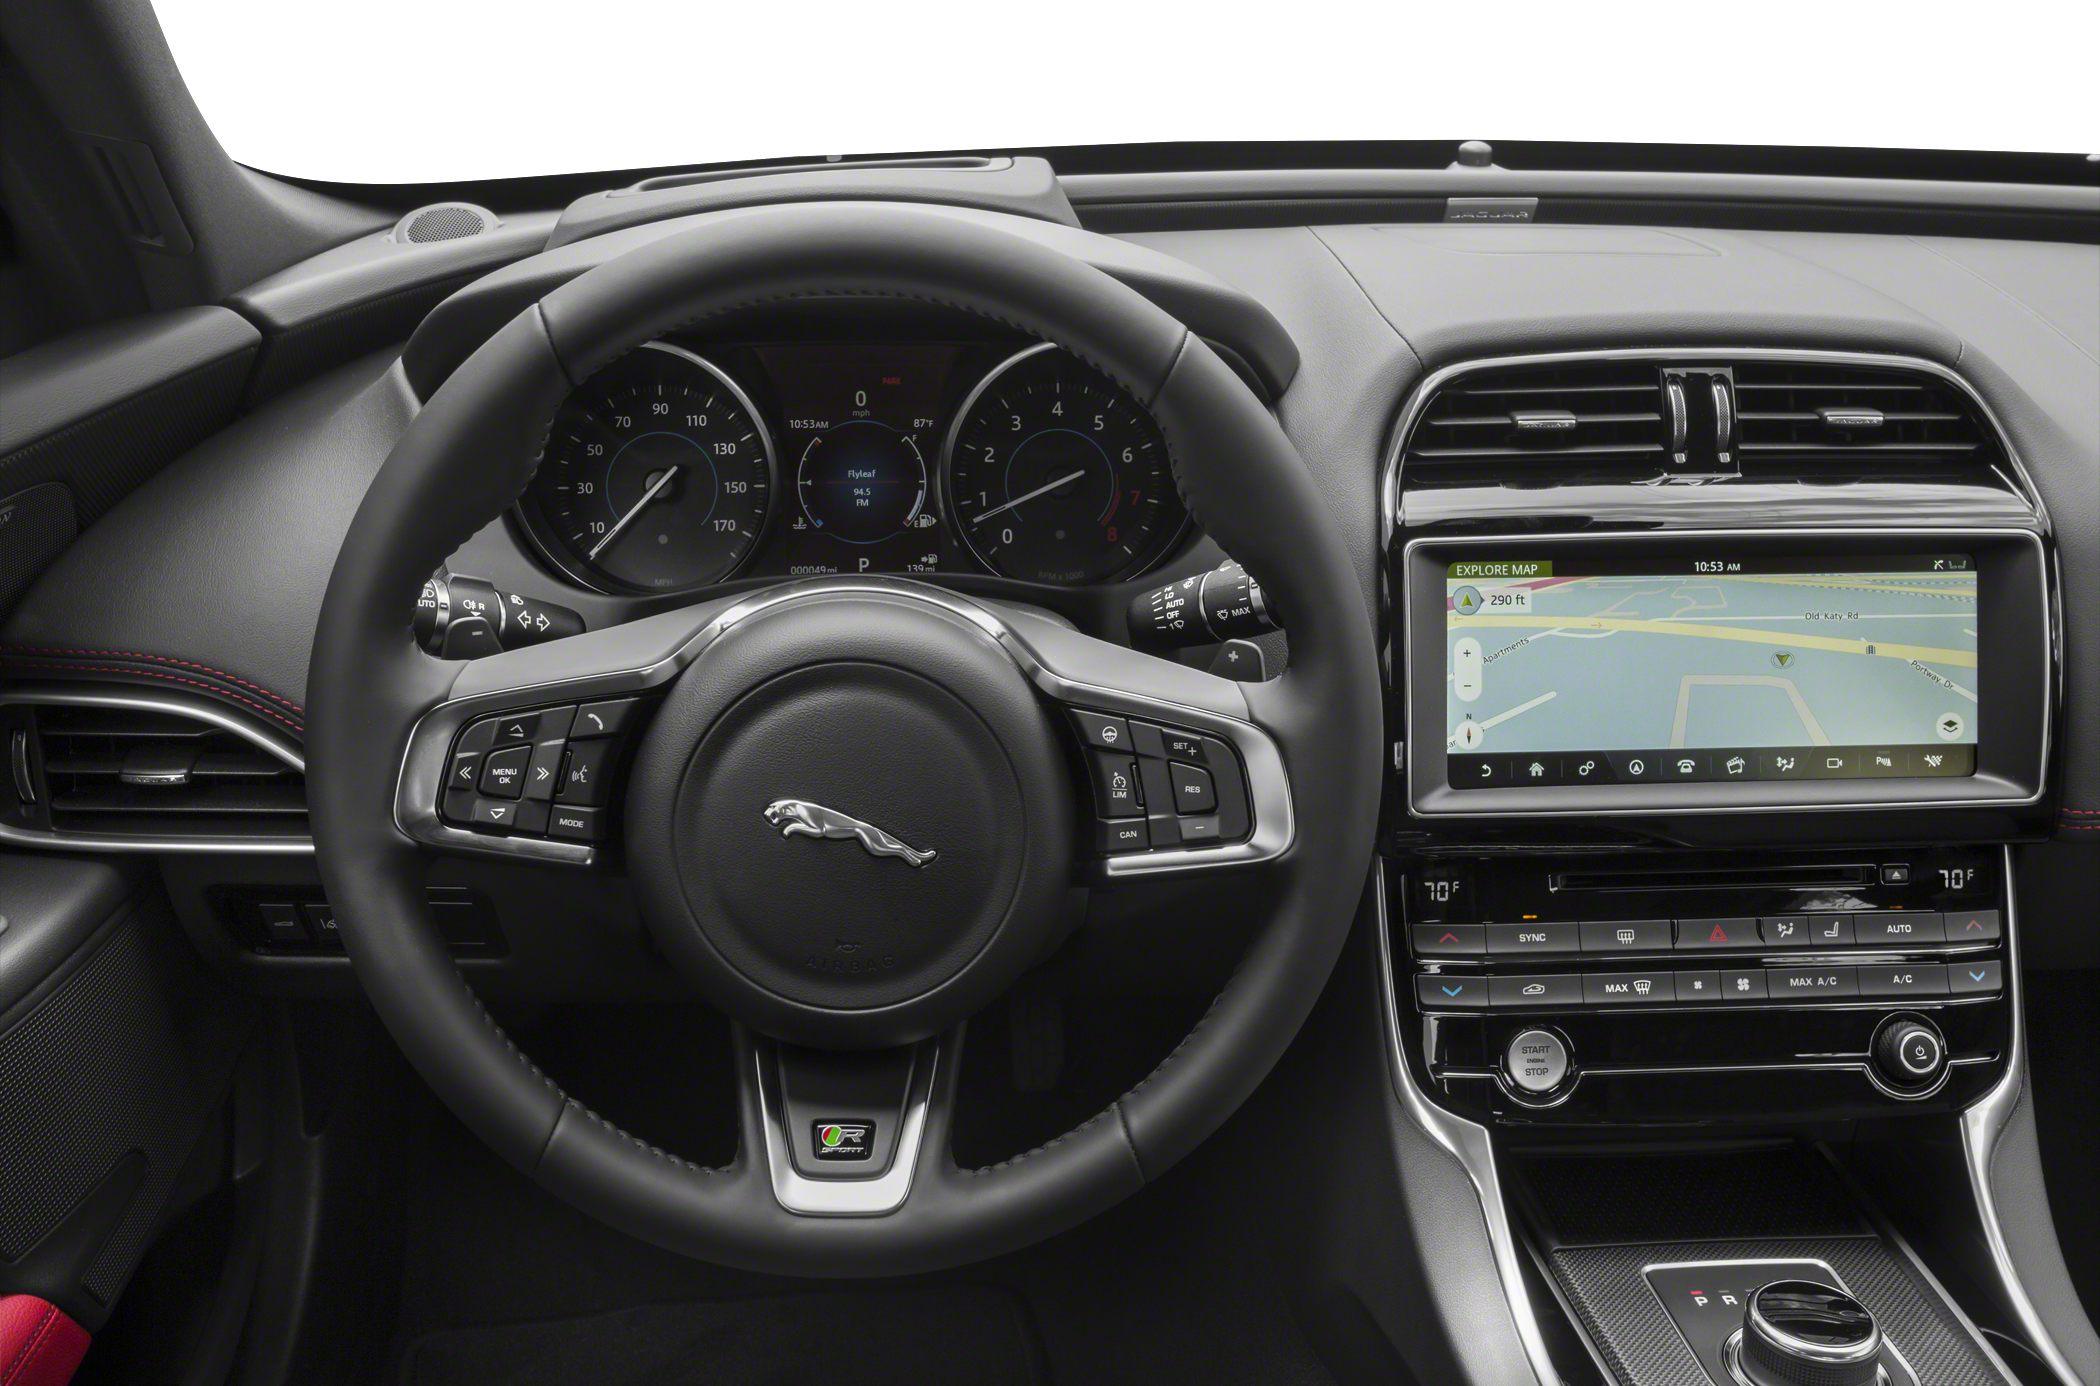 2018 Jaguar XE Pictures & Photos - CarsDirect